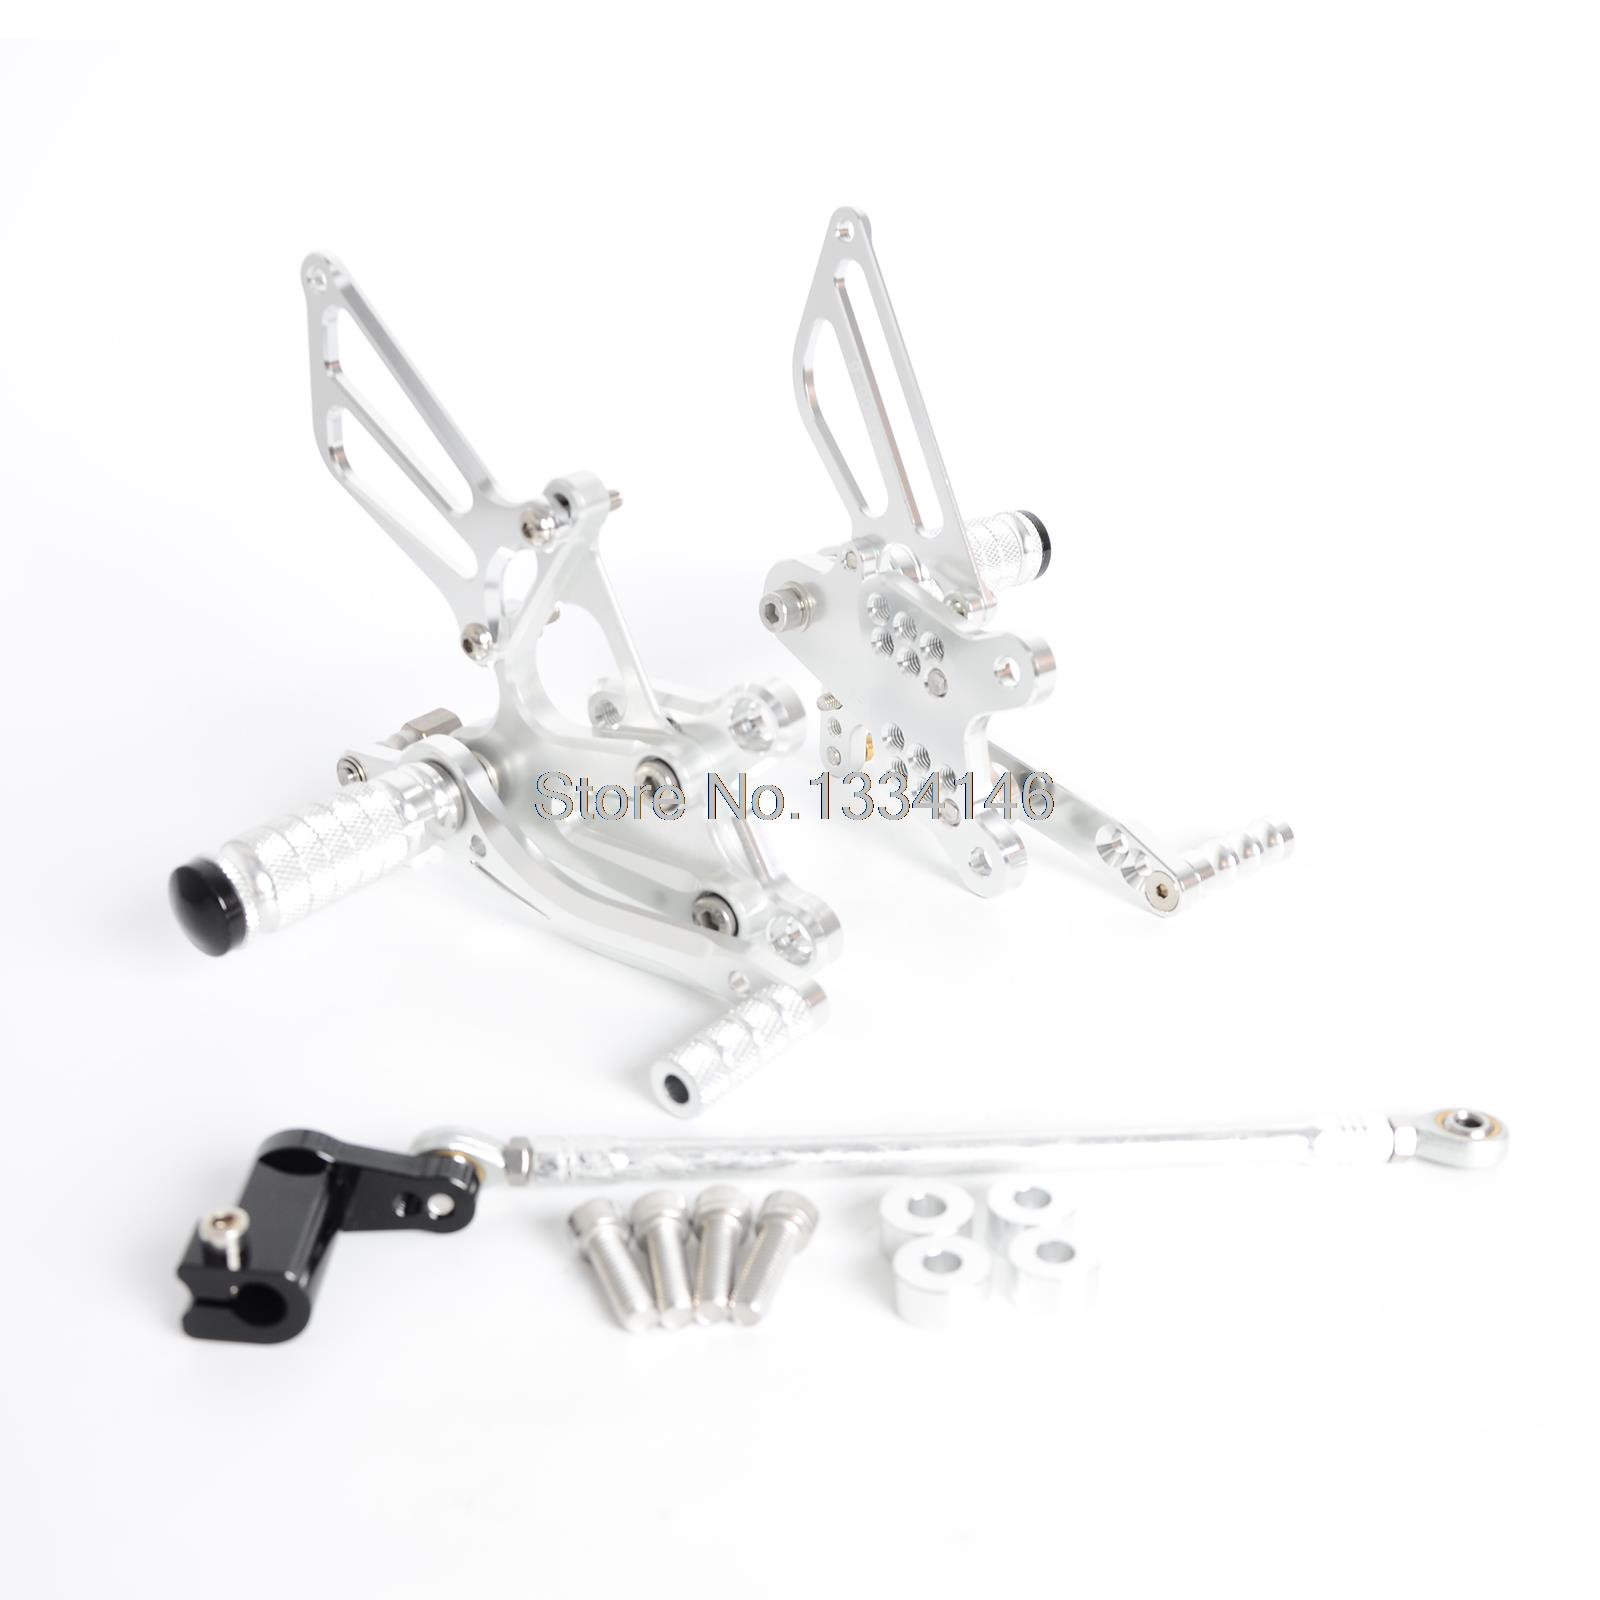 CNC Silver Adjustable Rearset Foot Peg Rear Sets For Honda CBR929 CBR929RR 2001 2002 l r pillion foot peg for honda c70 ct90 cb125 cb200 cg110 cg125 jx110 jx125 xl250 xl350